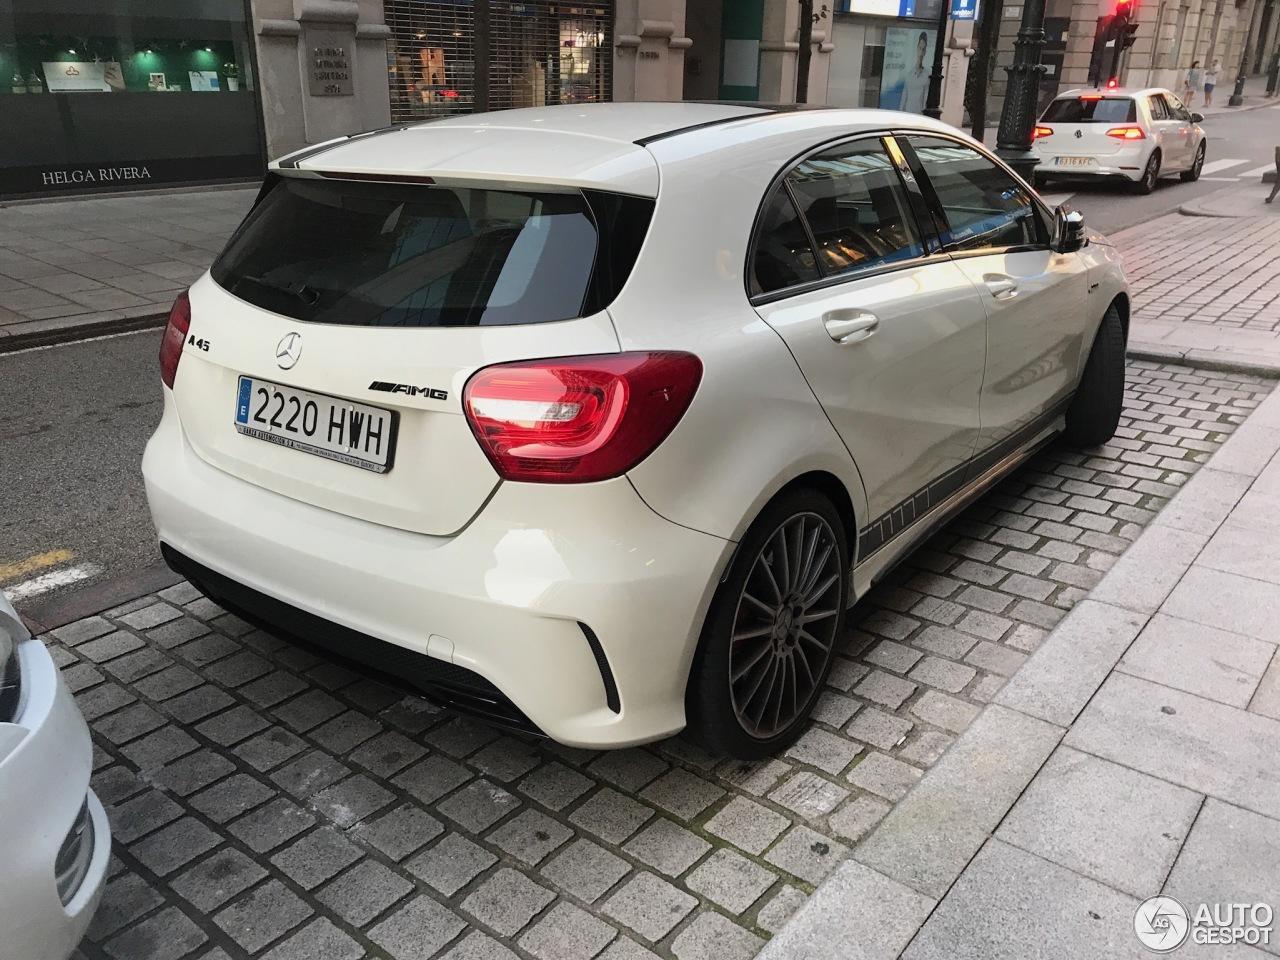 Mercedes-Benz A 45 AMG Edition 1